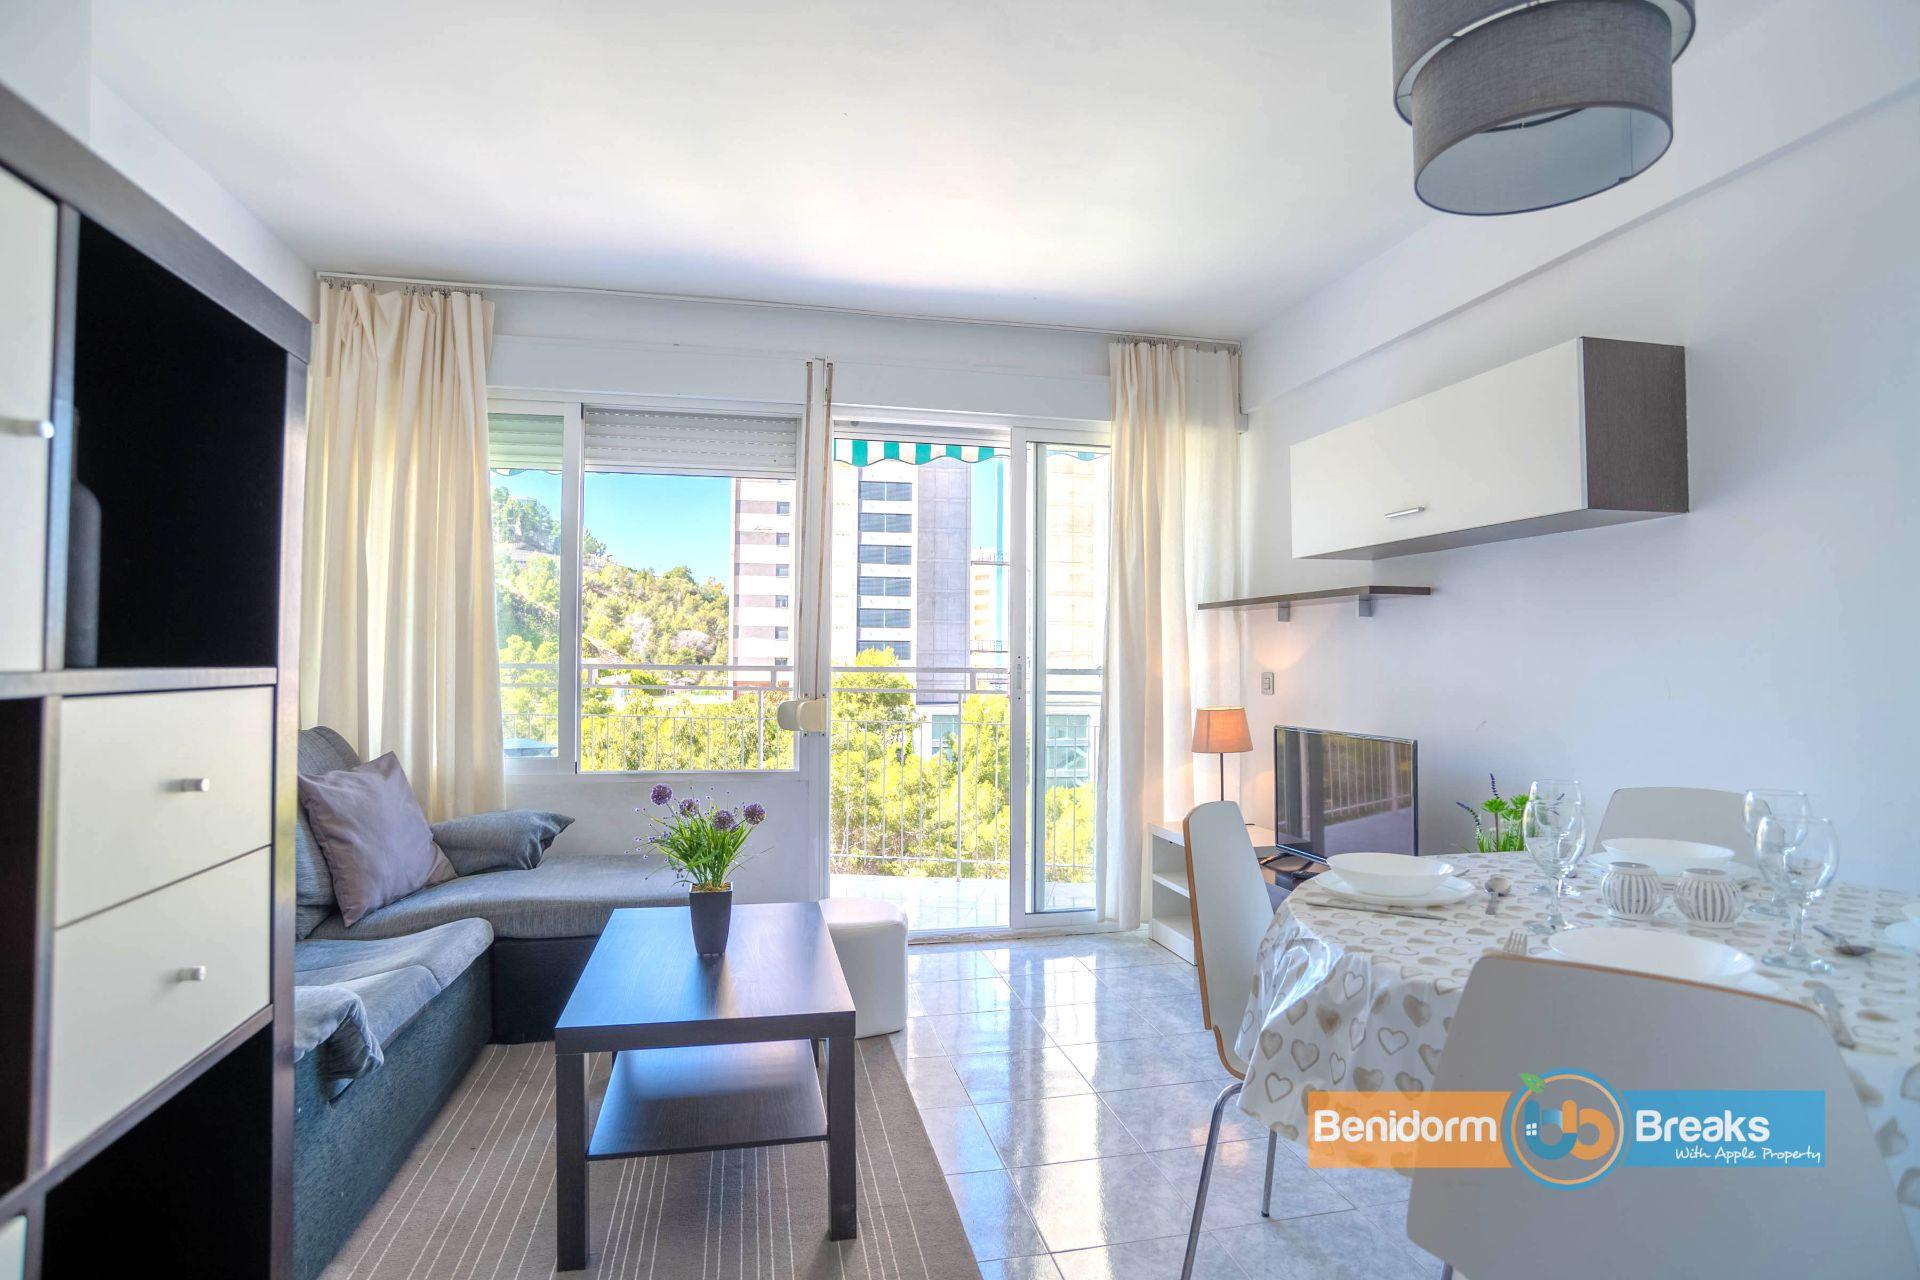 Apartment in Benidorm, holiday rentals